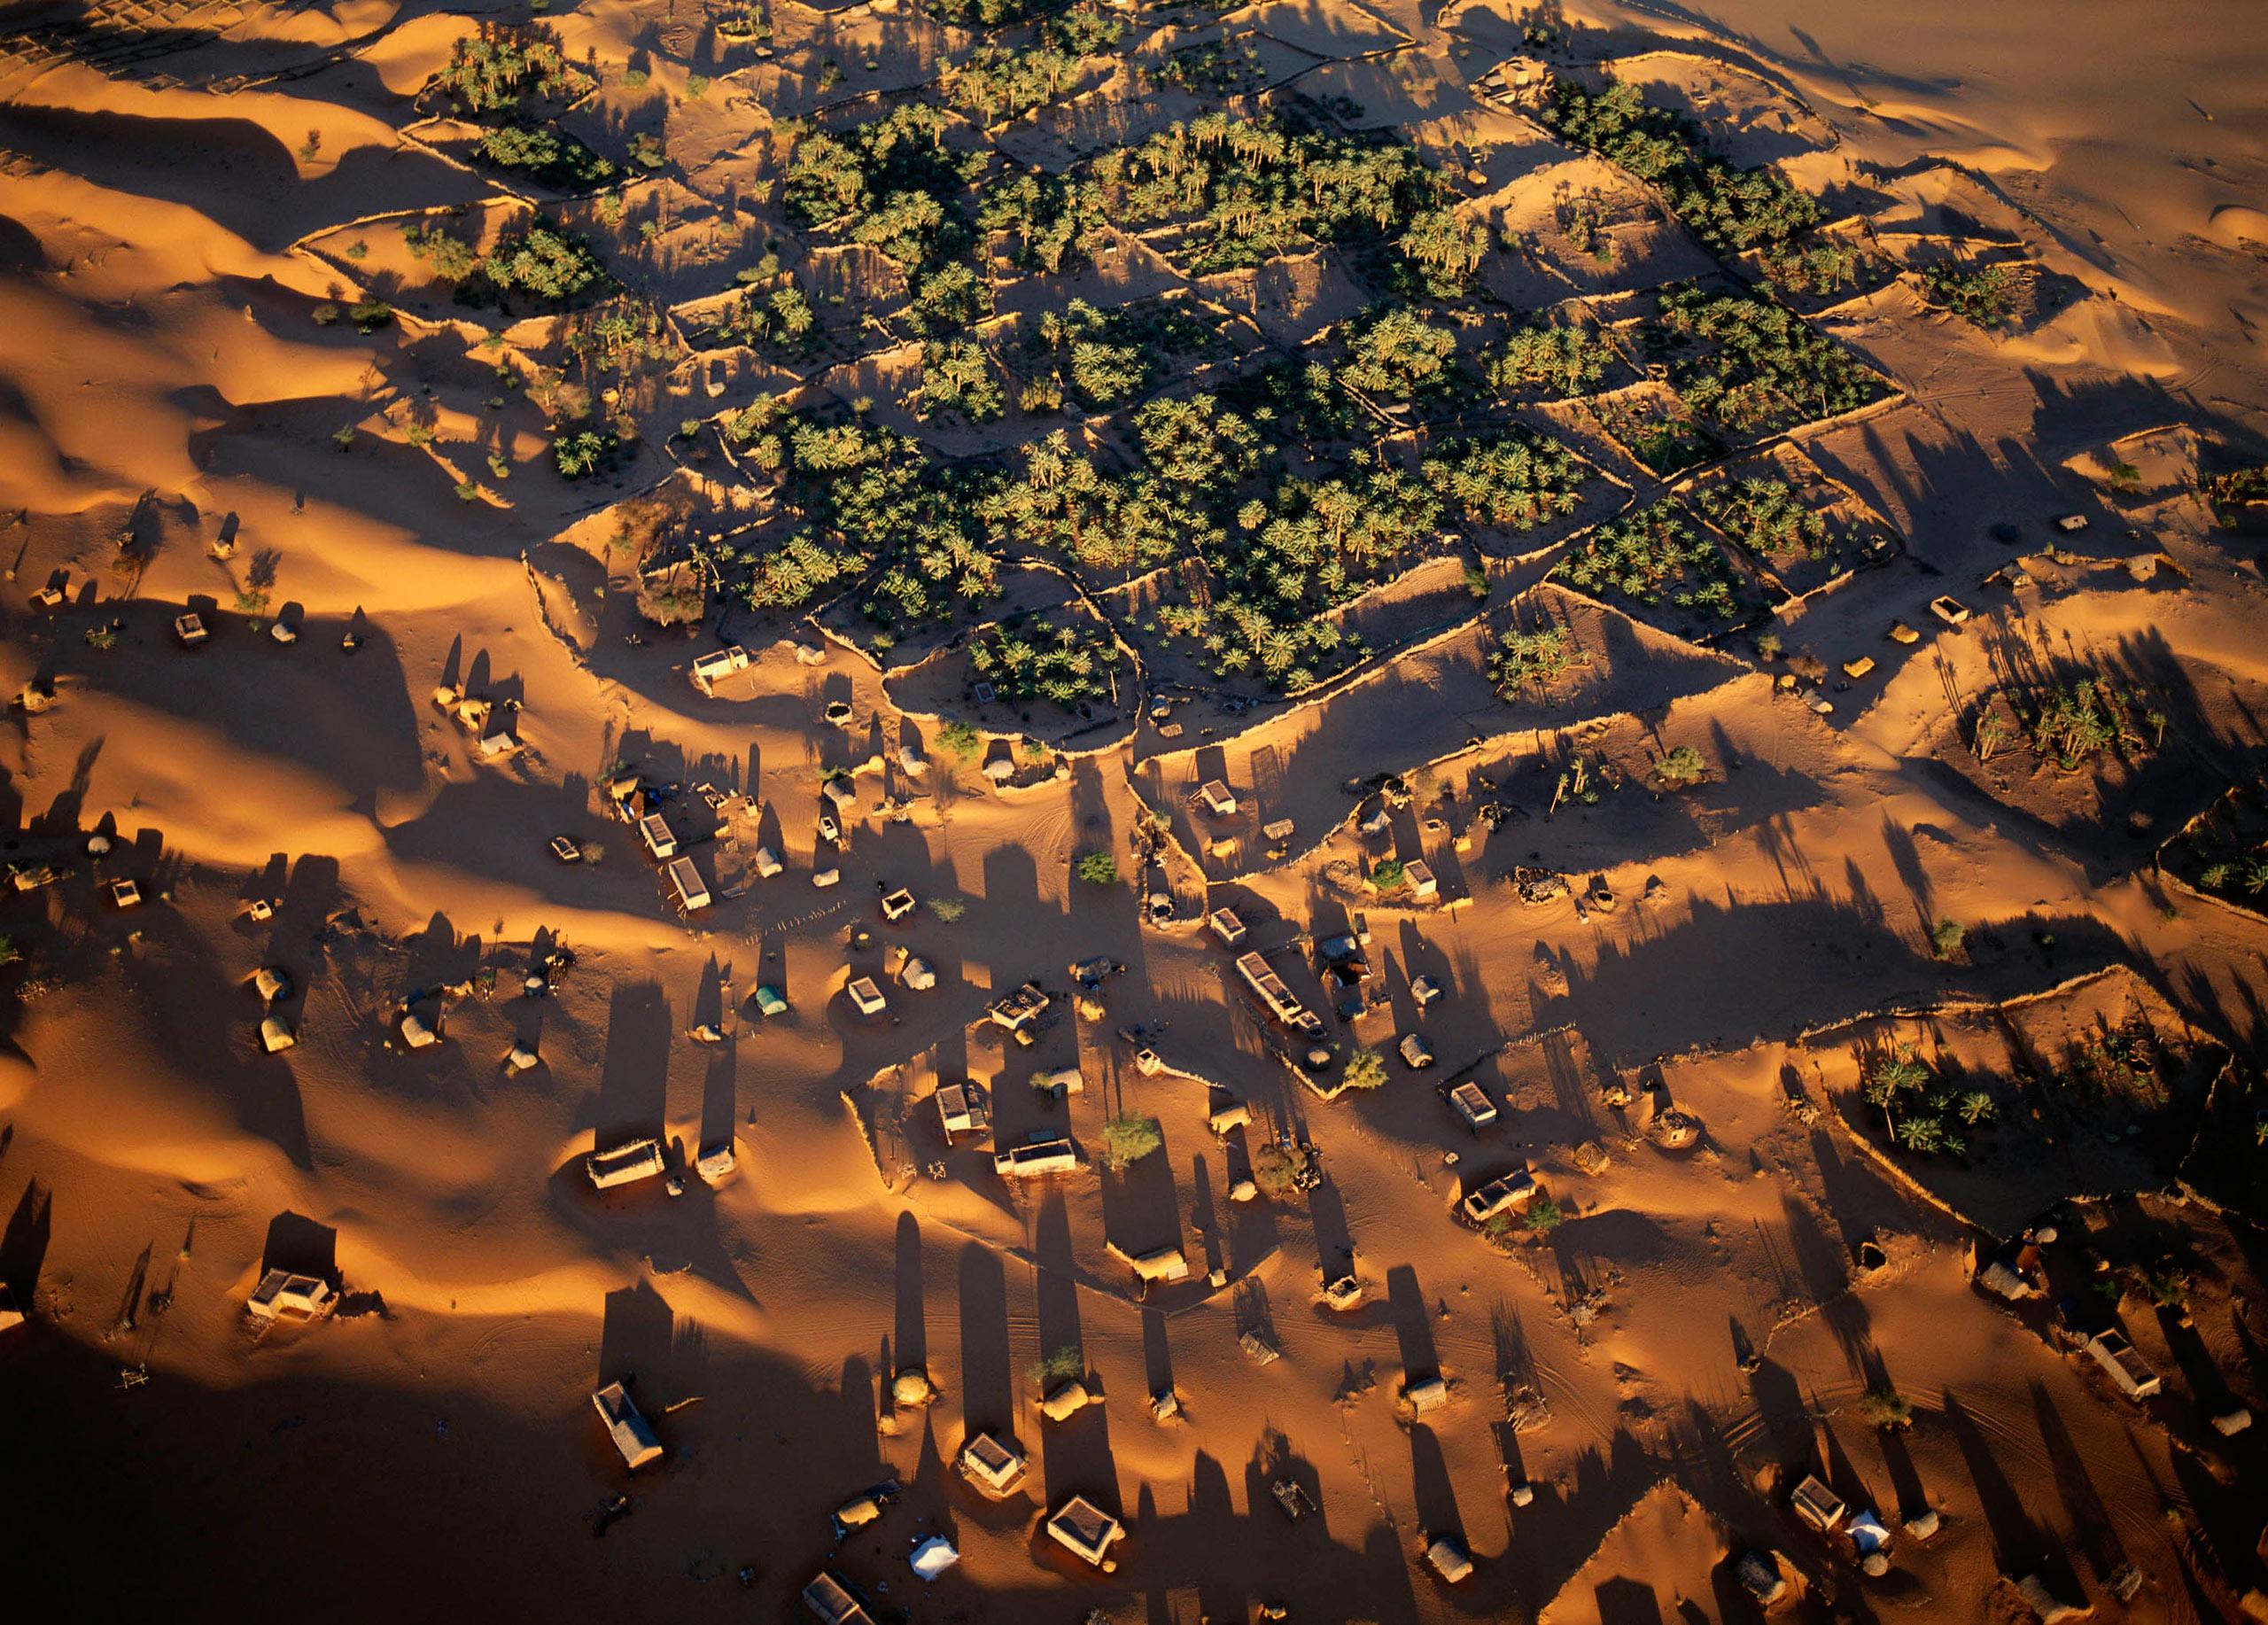 Tekenket, Mauritania.